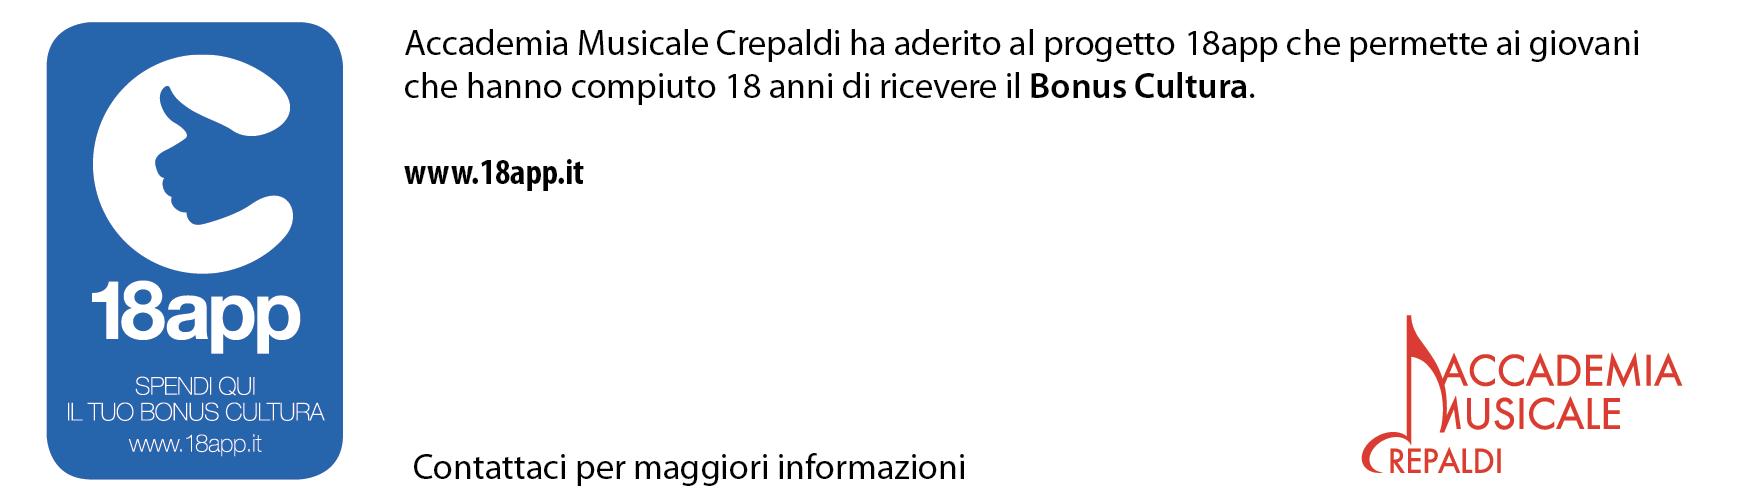 Accademia Musicale Crepaldi - 18app